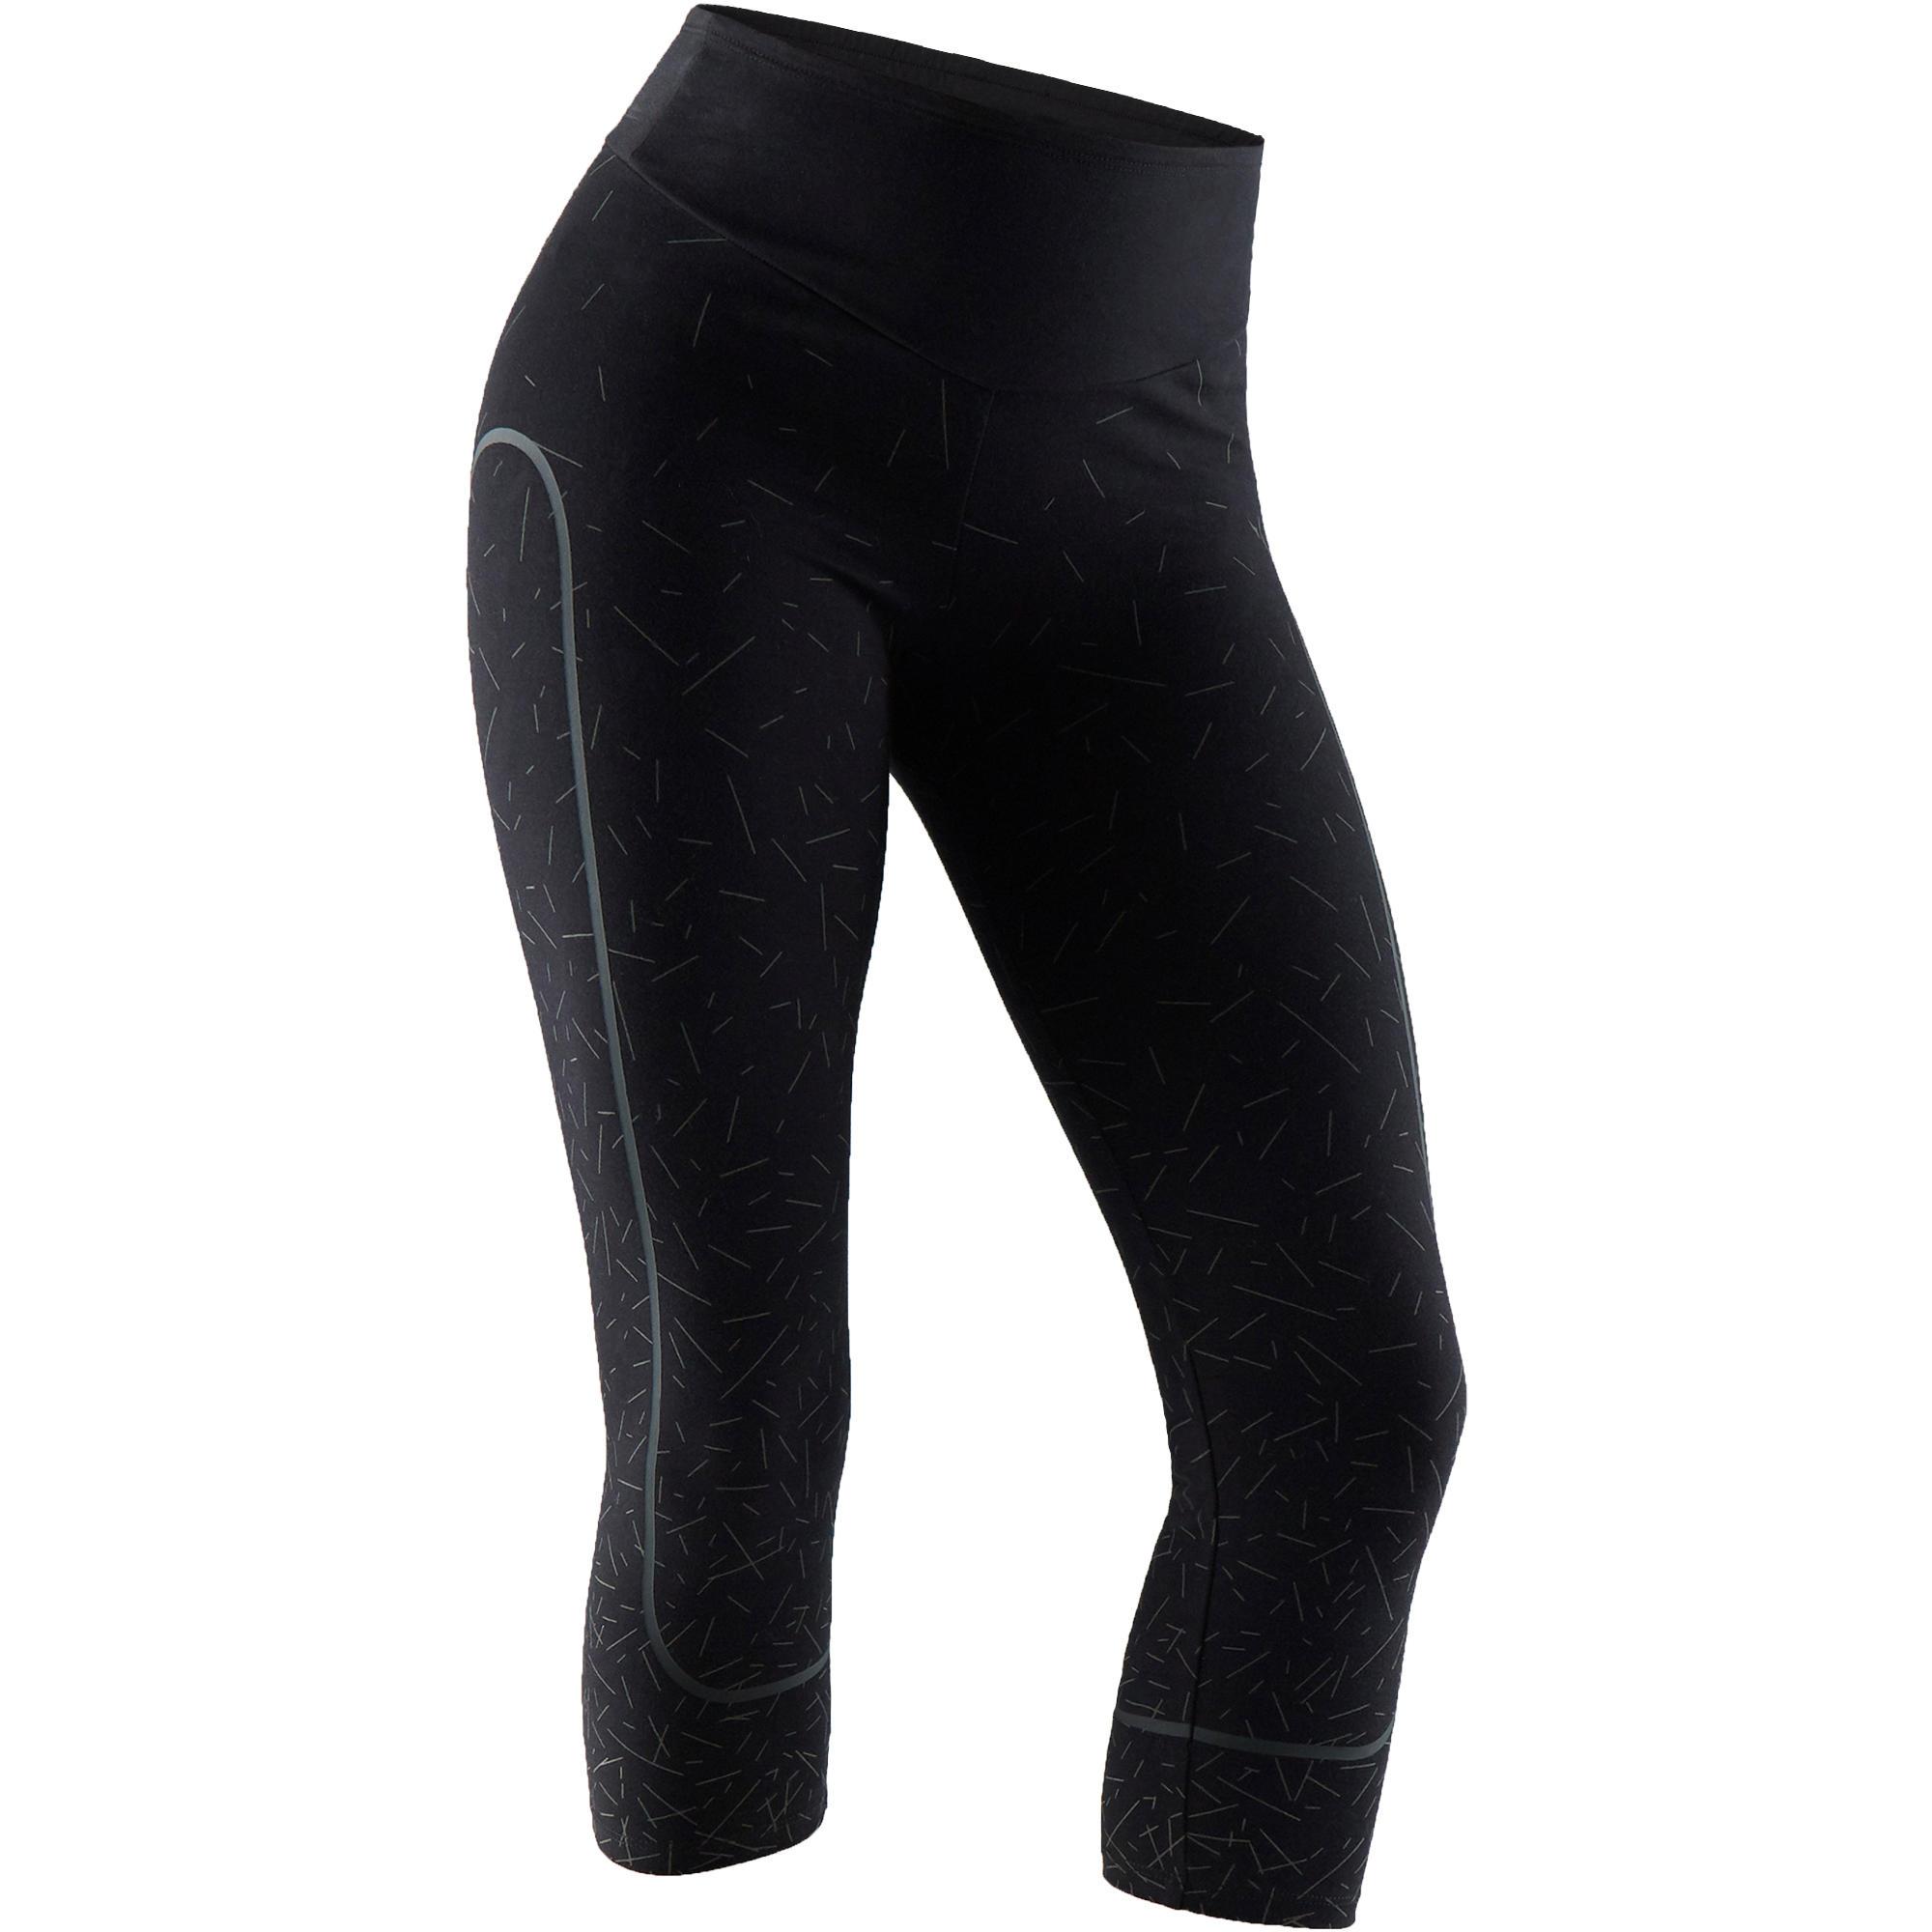 6e65ac93444 Domyos 7 8 legging 560 pilates en lichte gym dames zwart print dots